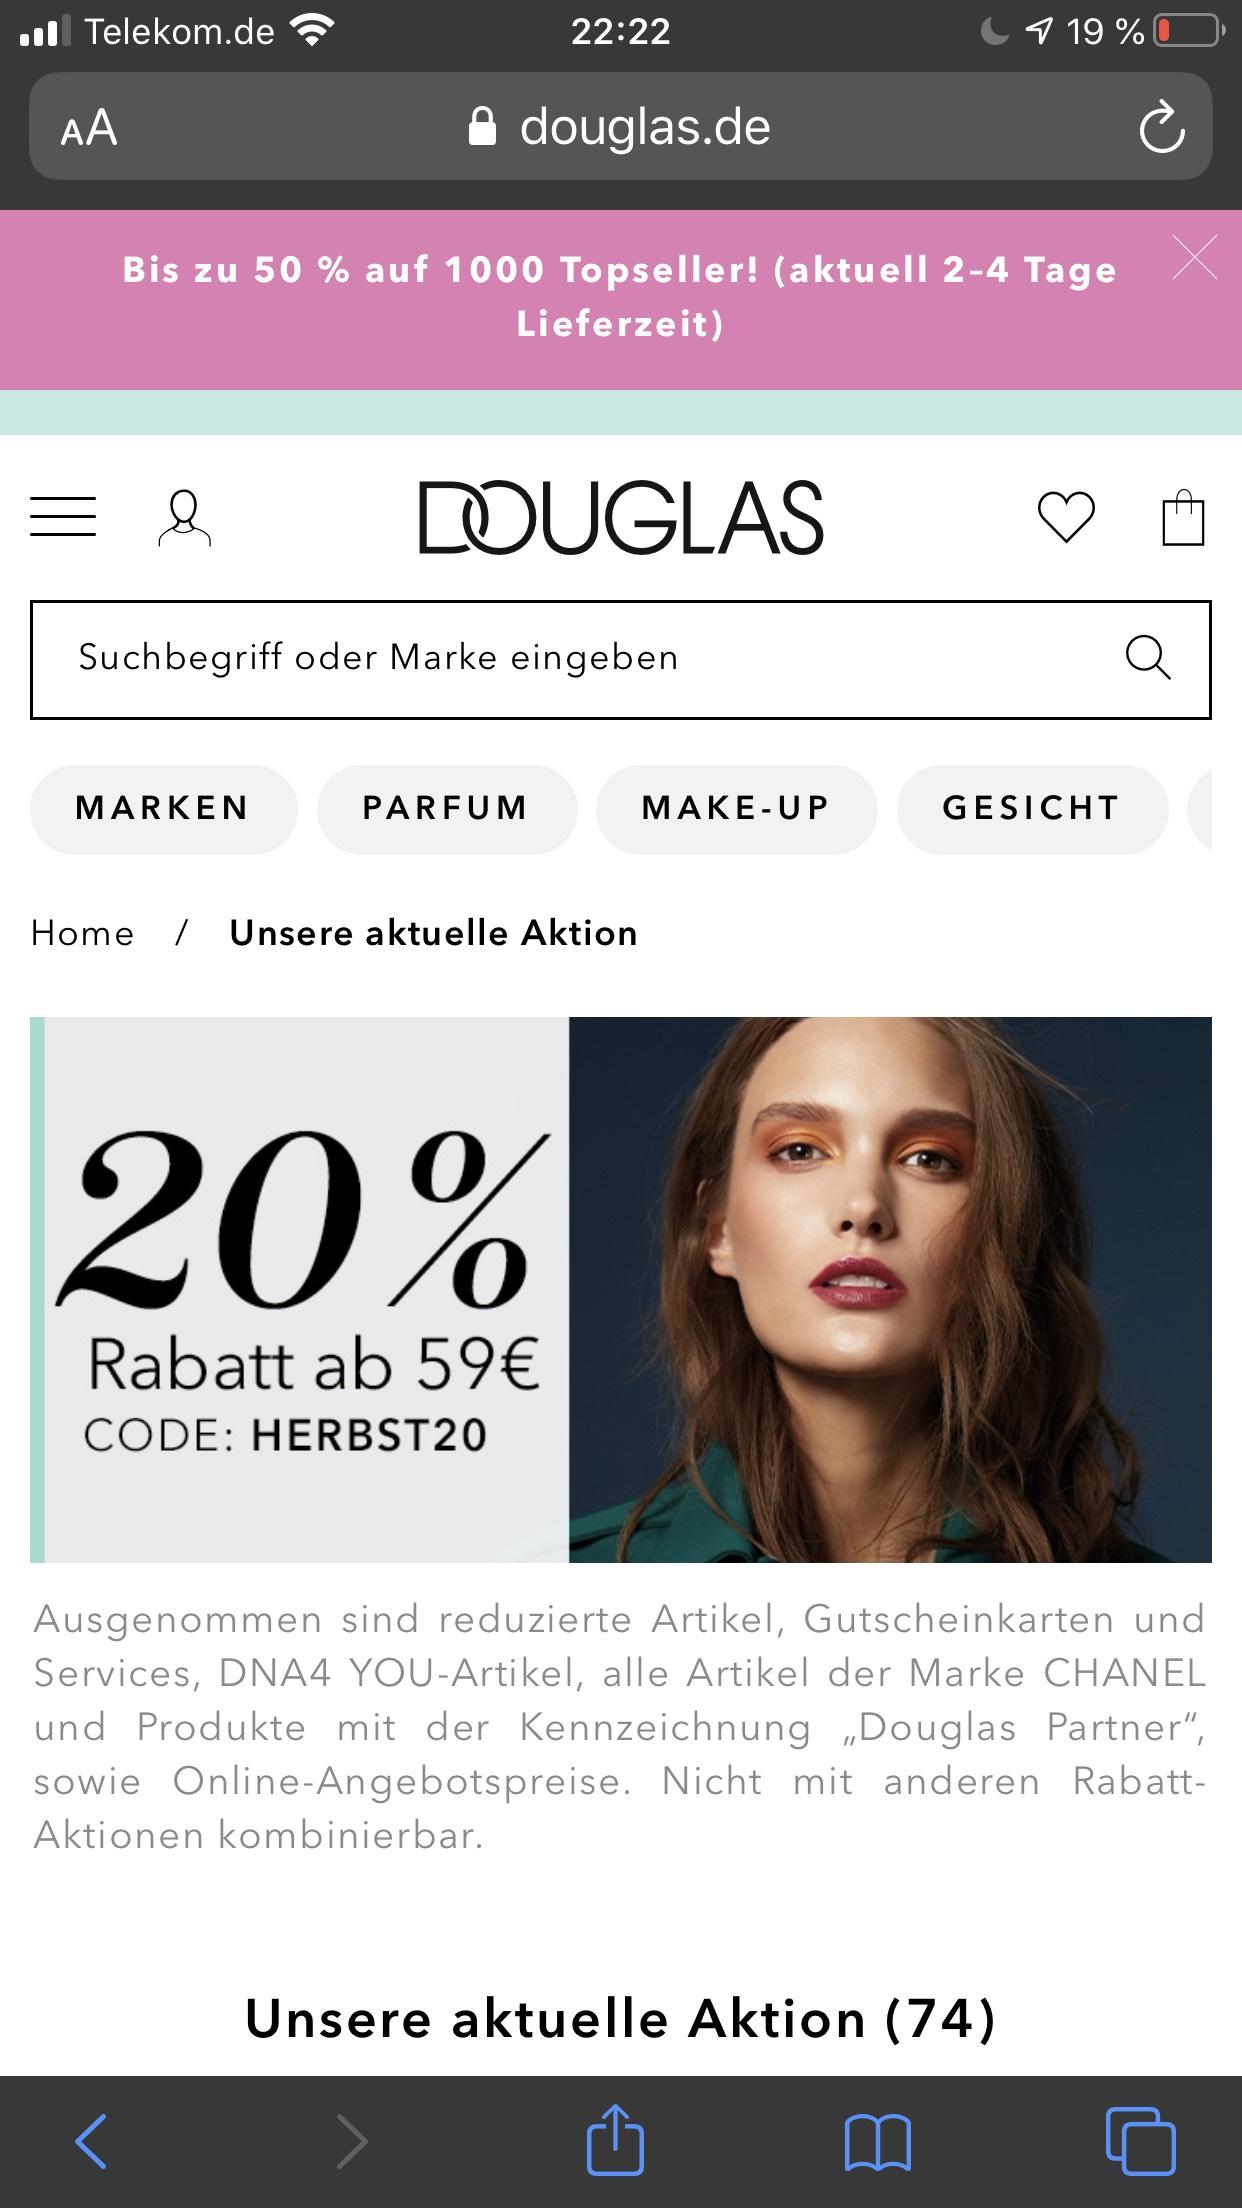 Douglas 20% Rabatt ab 59 Euro Einkaufswert